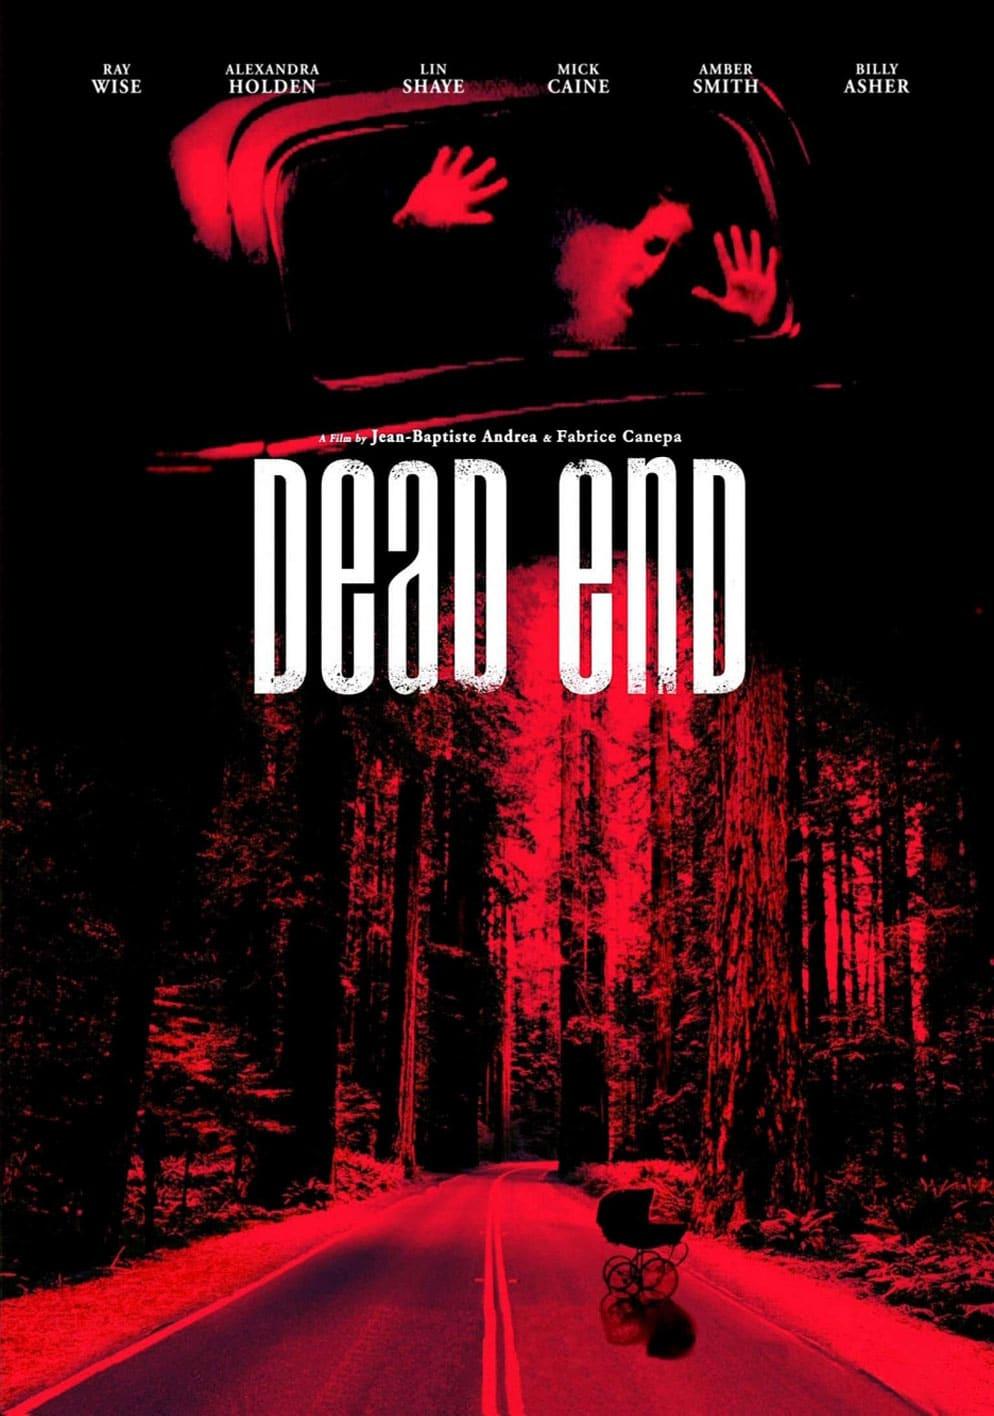 dead end 2003 poster 4